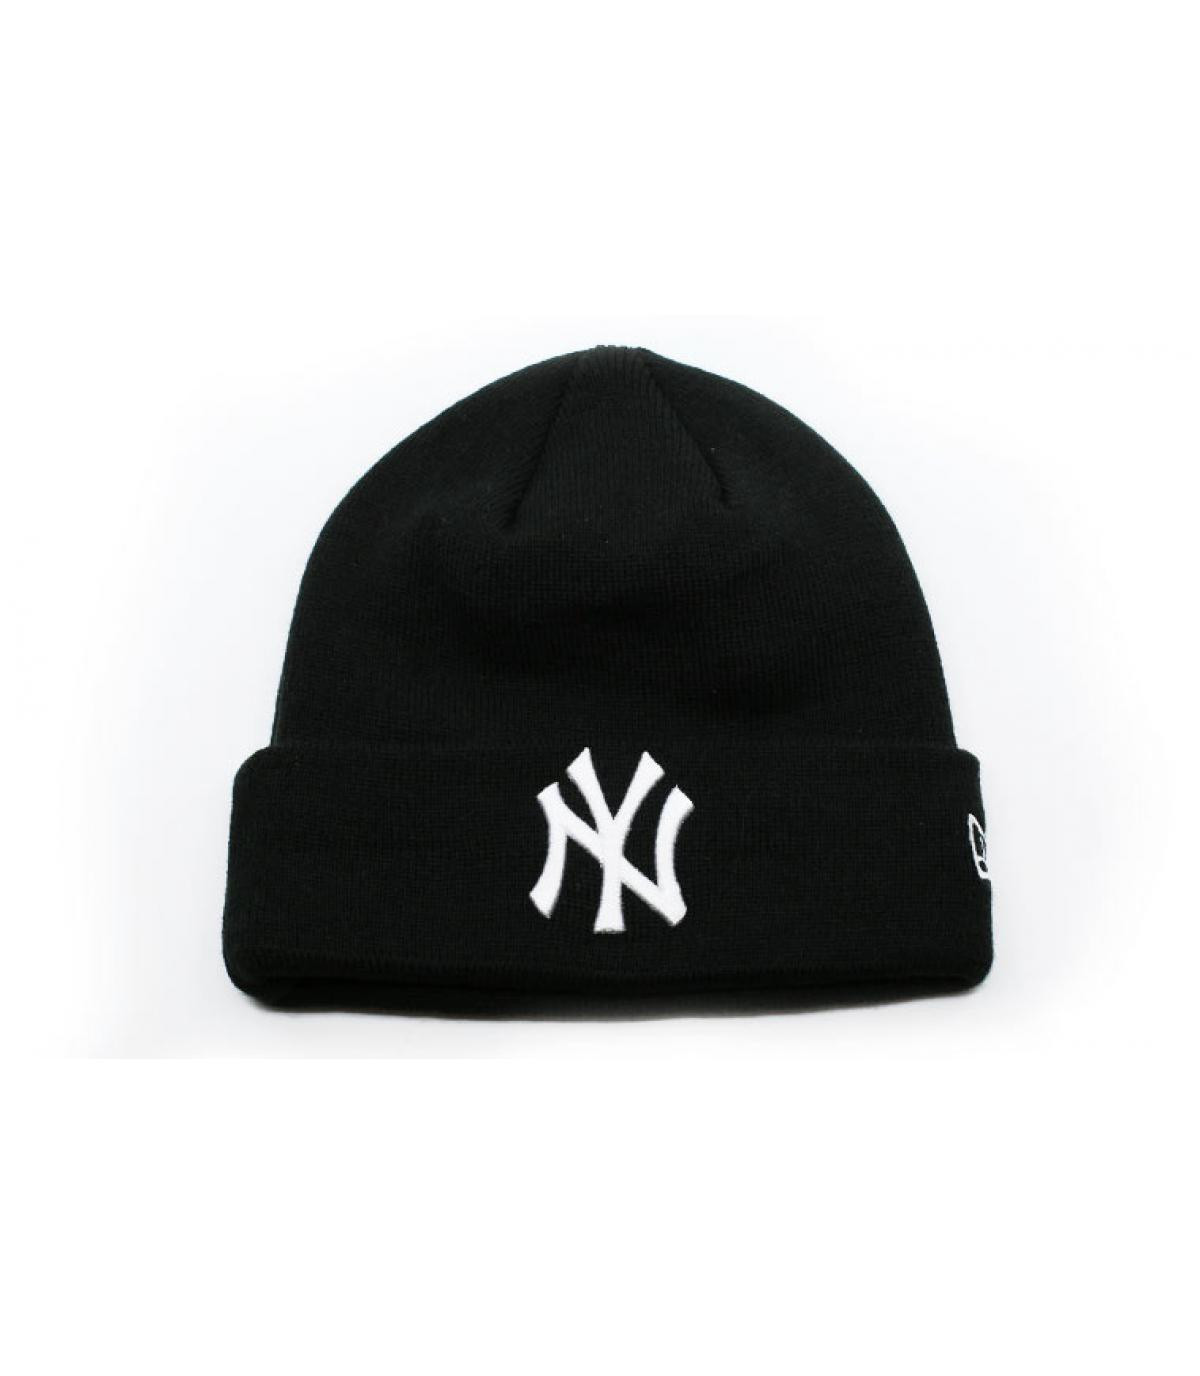 Details MLB Essential Cuff NY black white - afbeeling 2